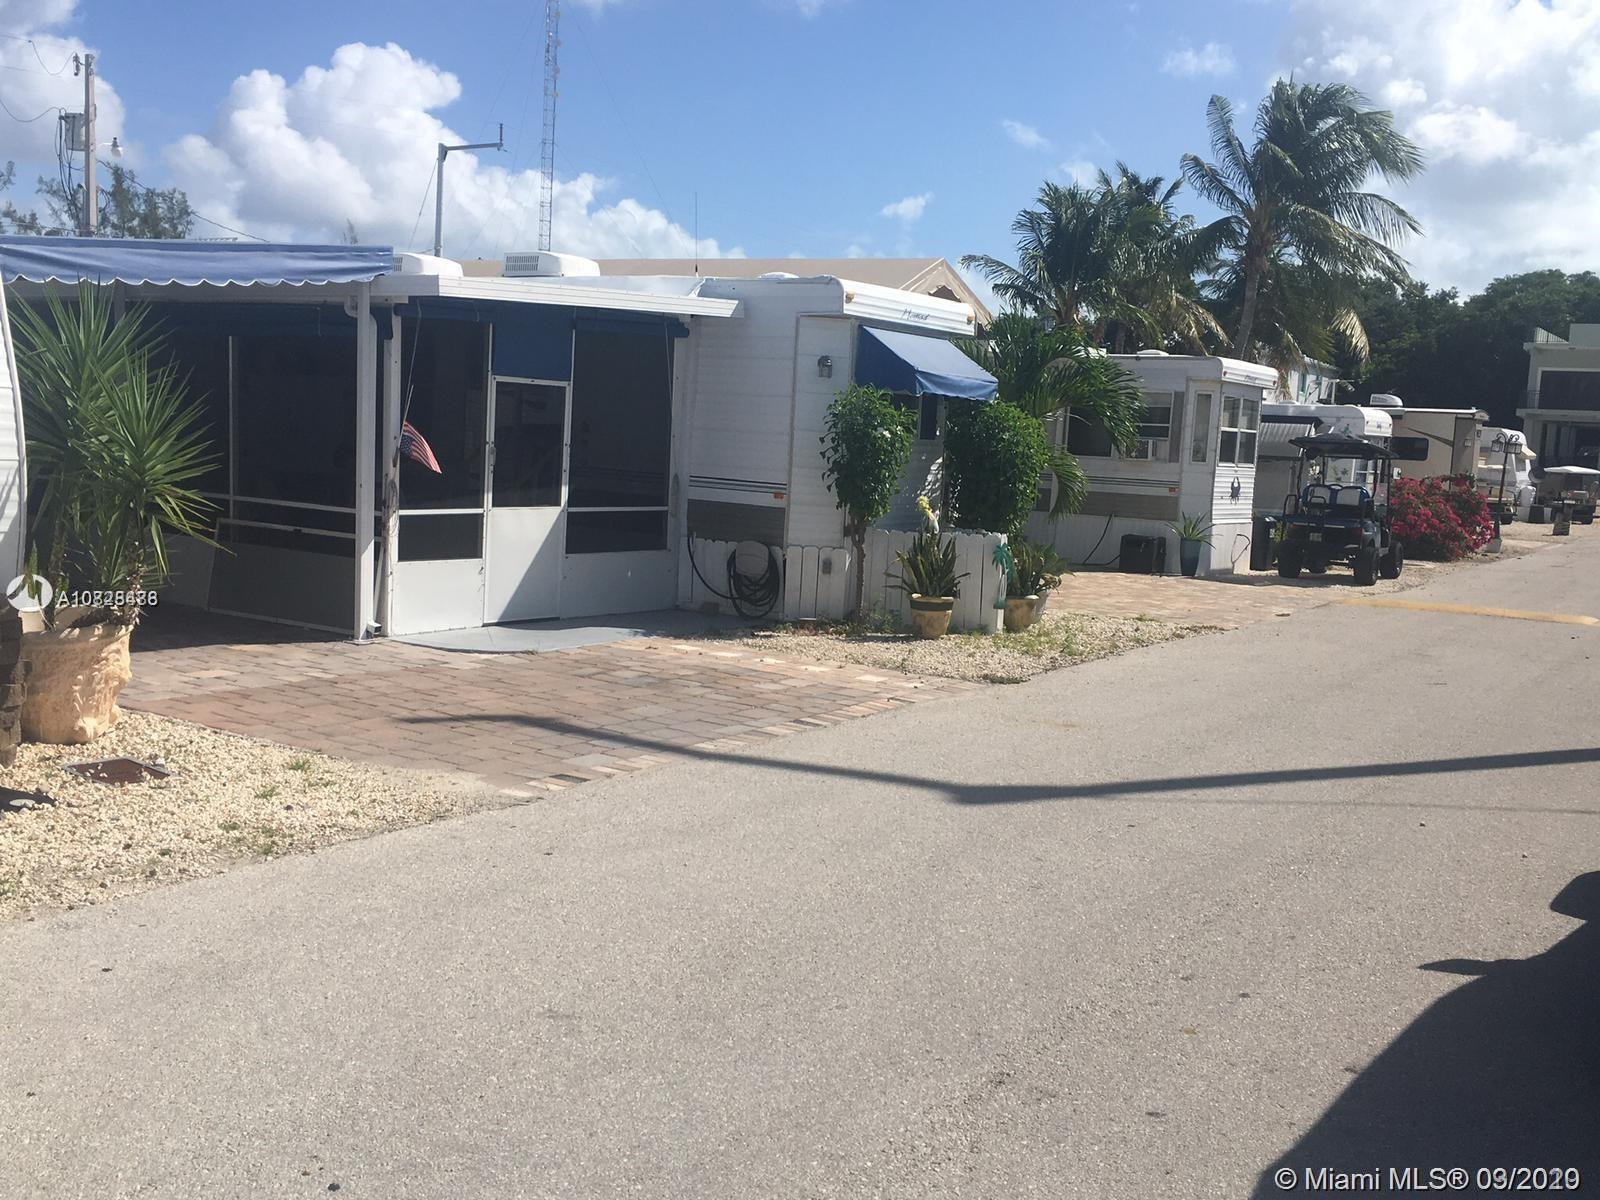 325 Calusa St #Lot 455, Key Largo, FL 33037 - Key Largo, FL real estate listing